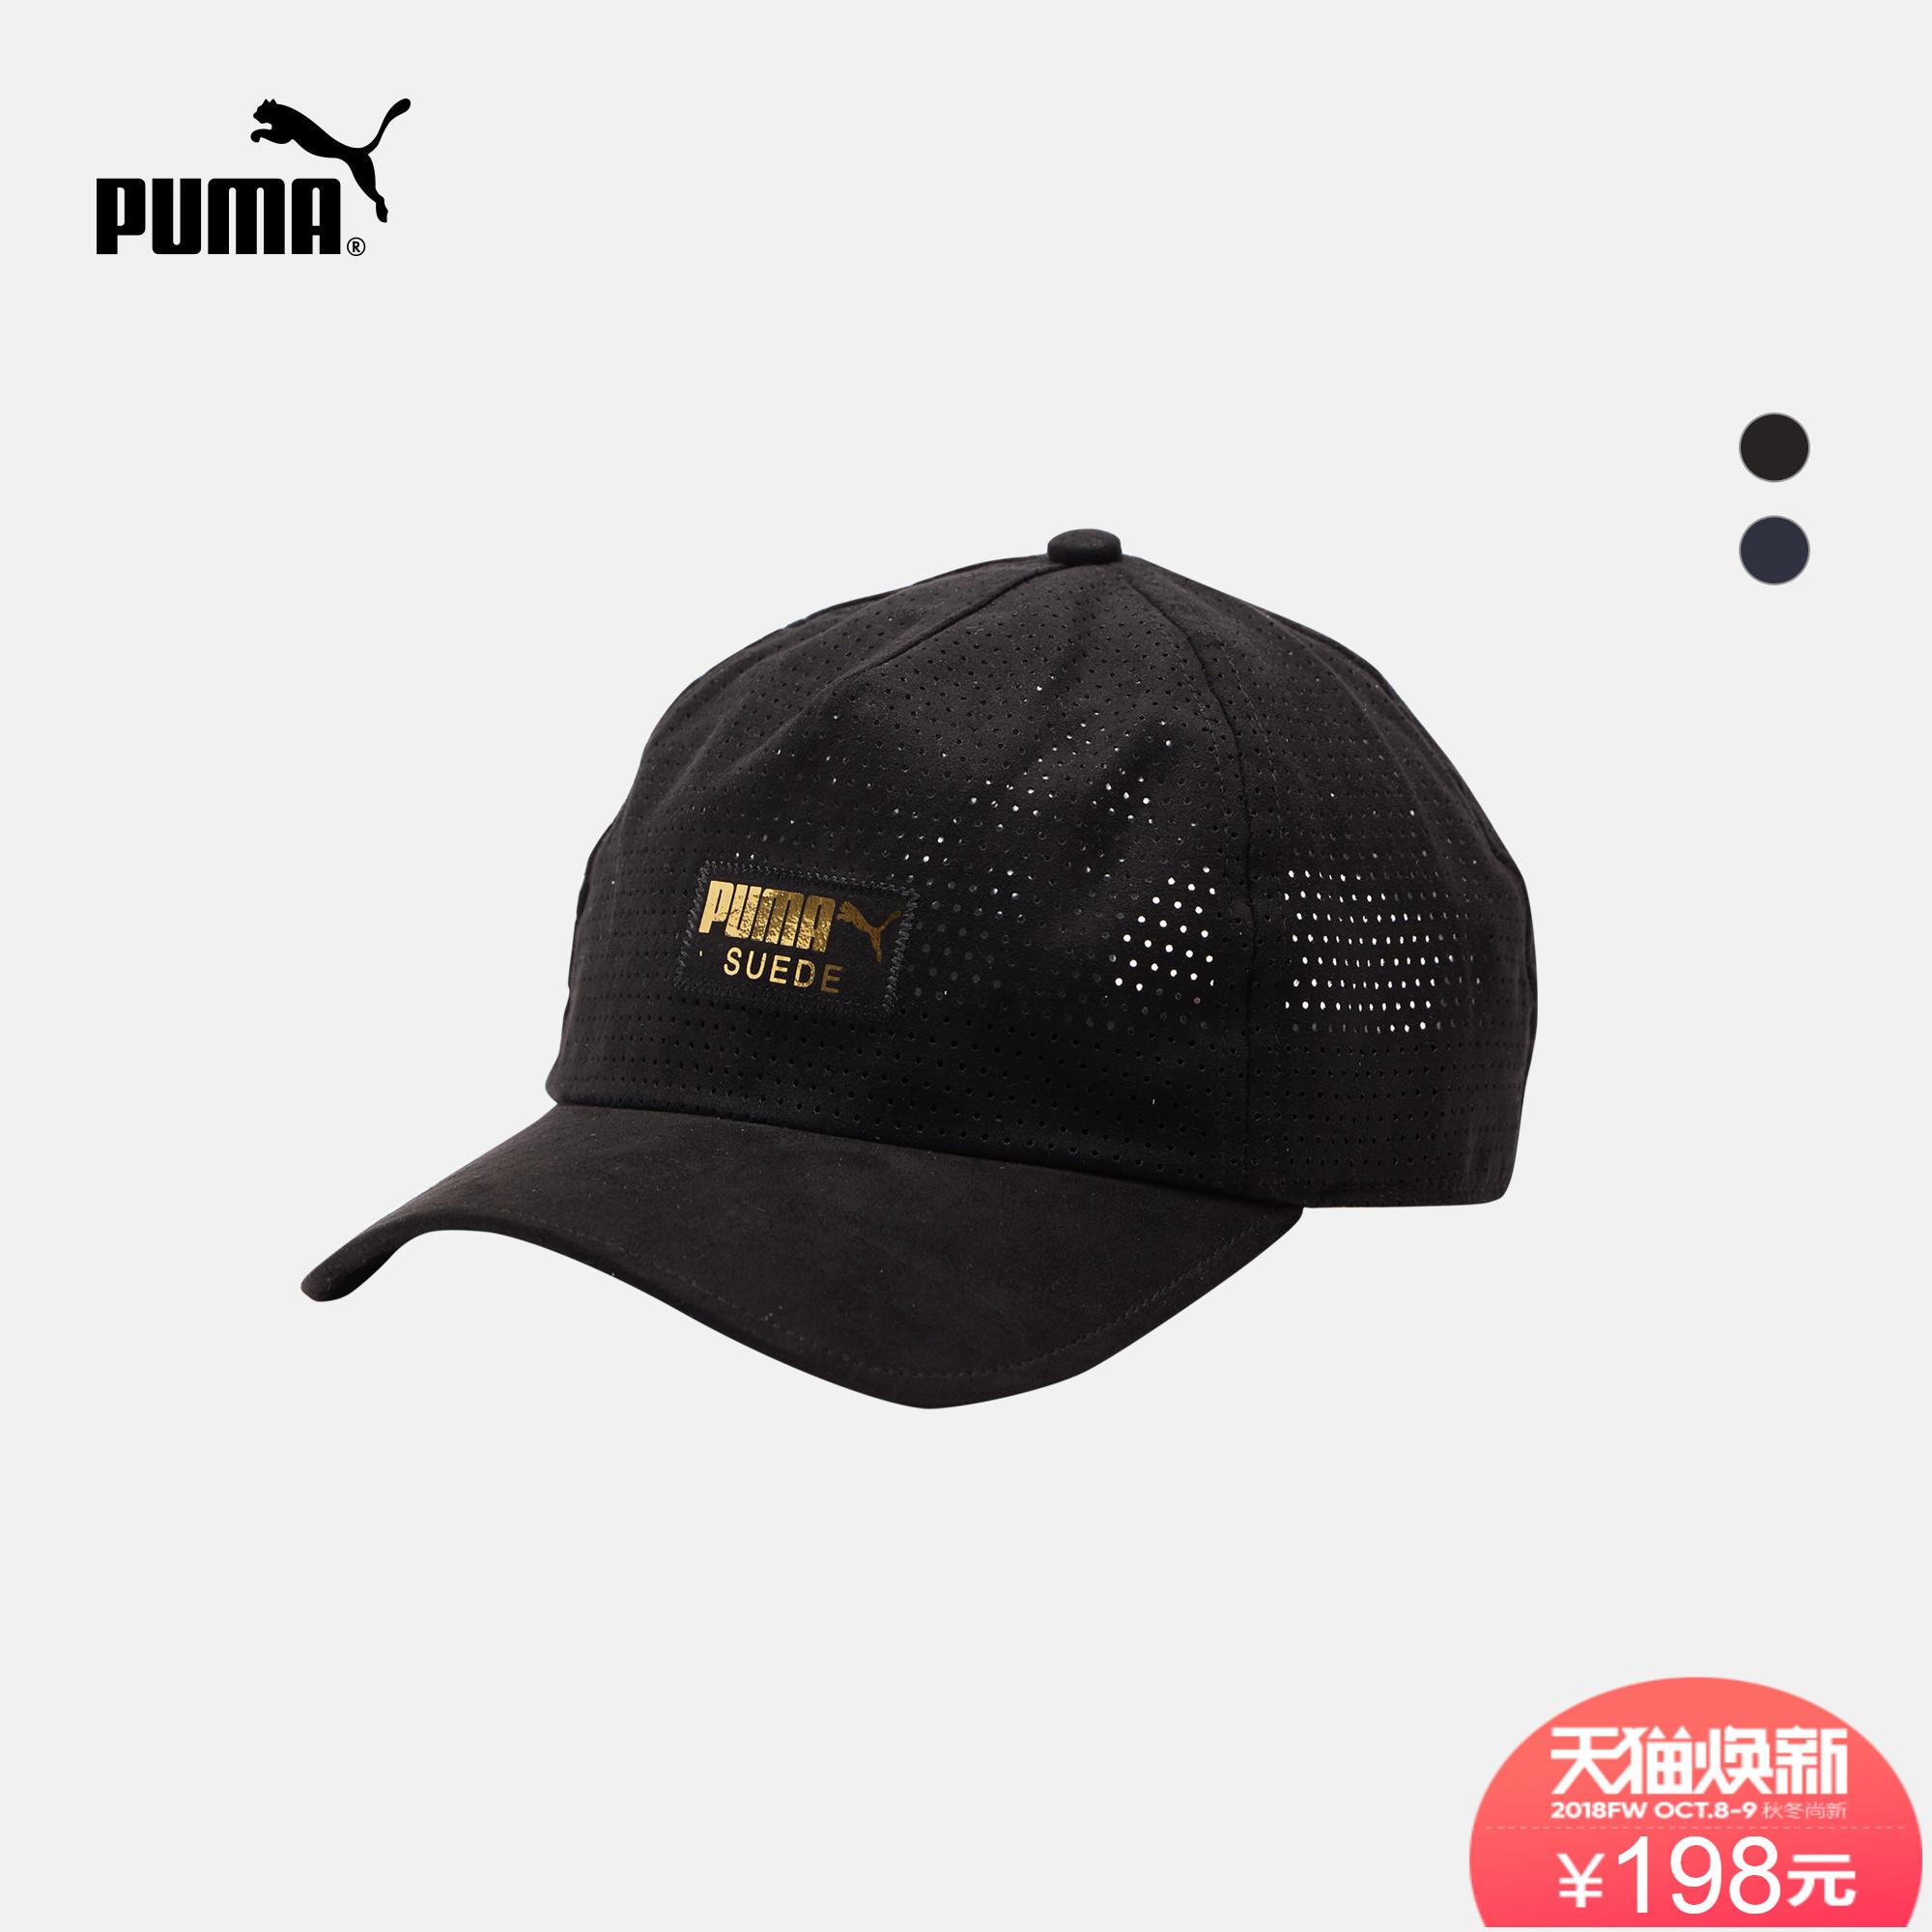 PUMA彪马官方 刘昊然同款 棒球帽 SUEDE 021717